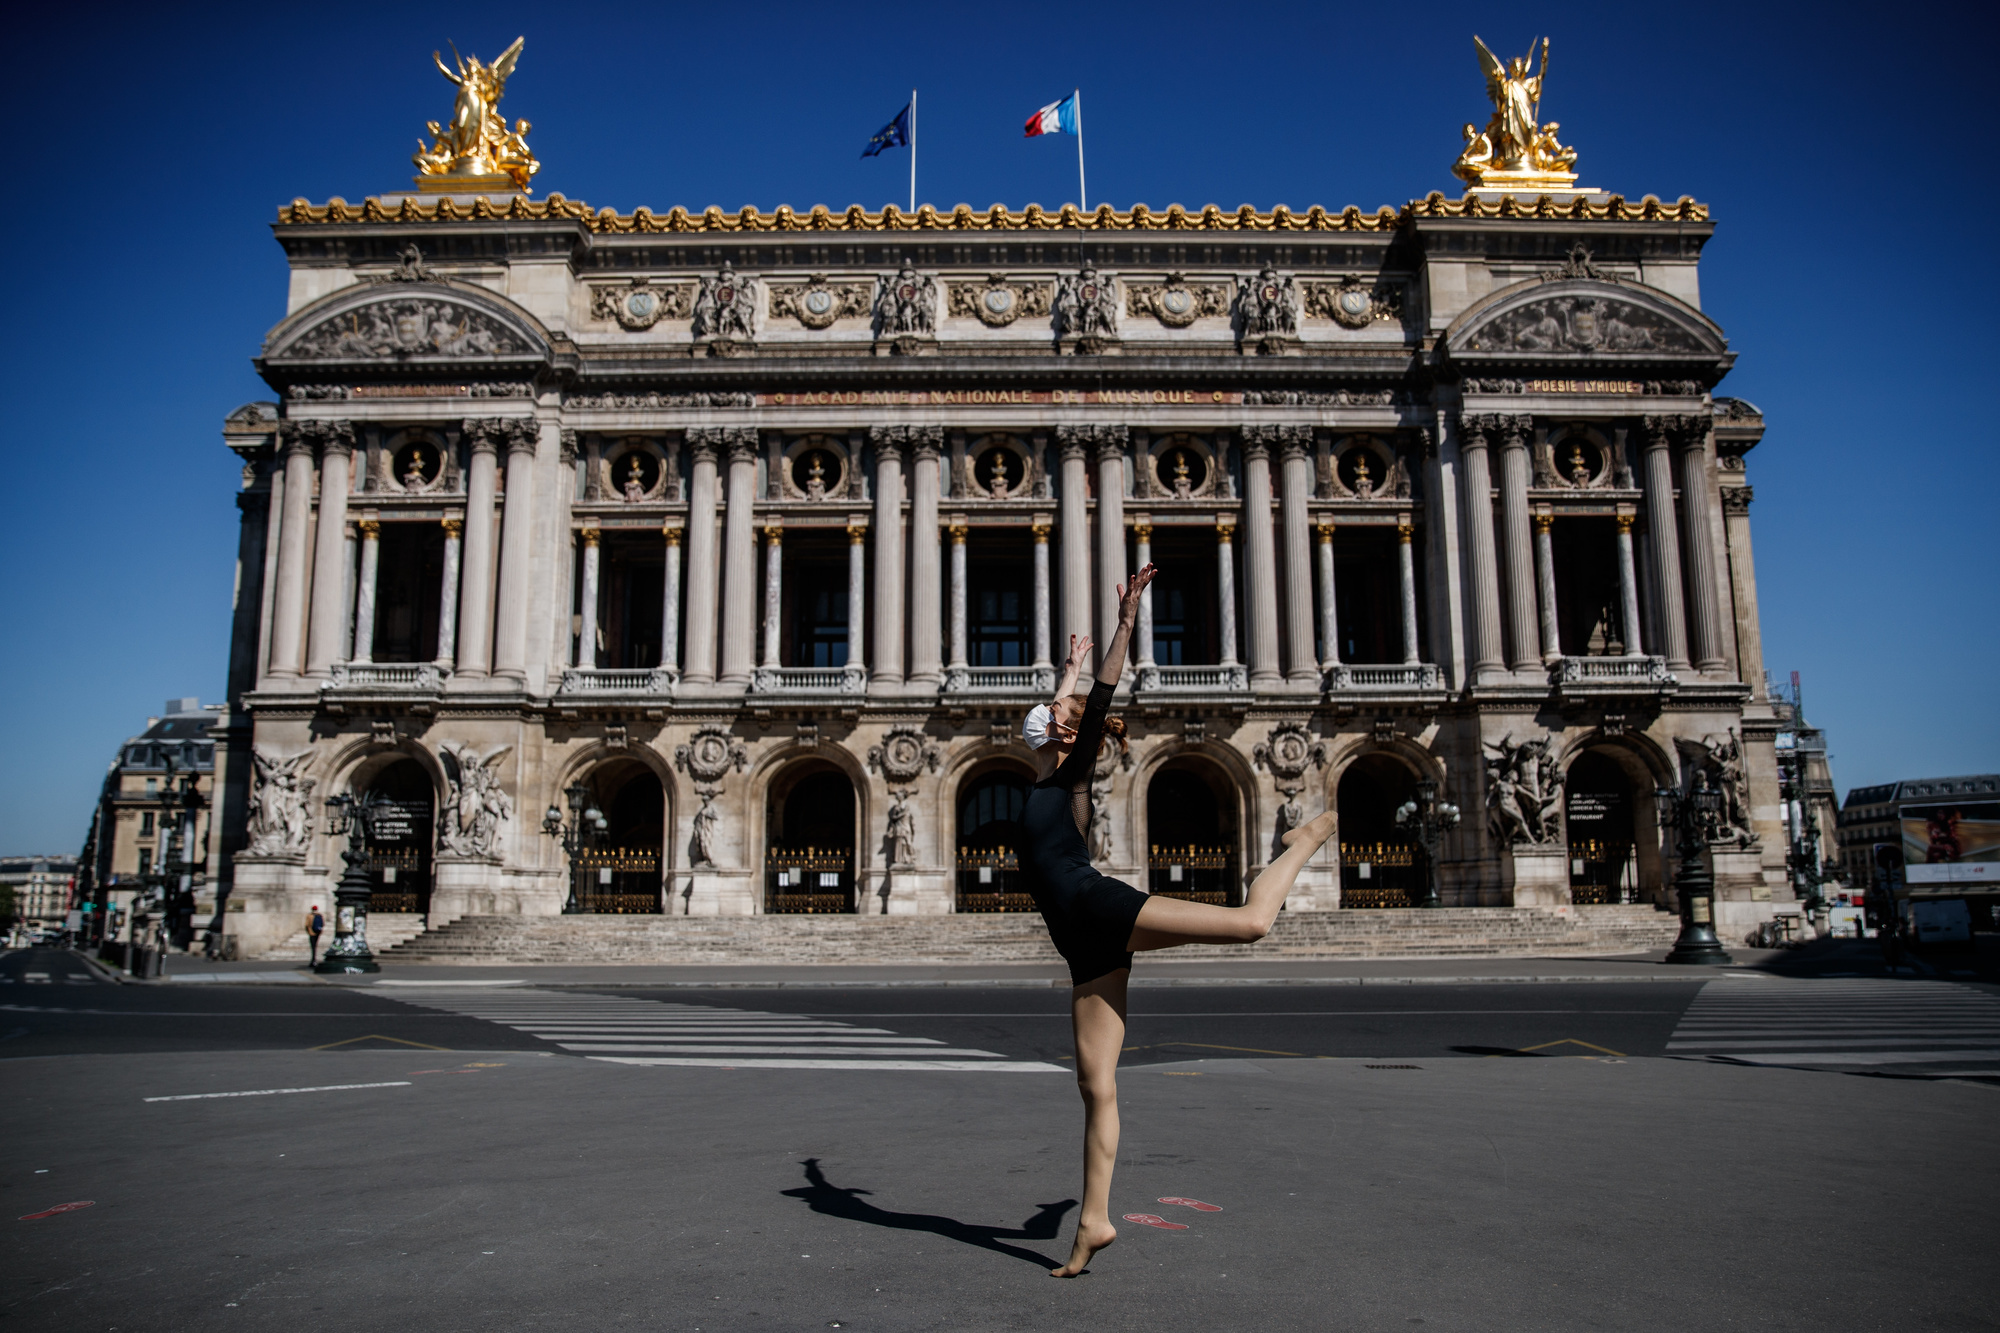 Yara al-Hasbani devant l'Opéra Garnier de Paris, belga